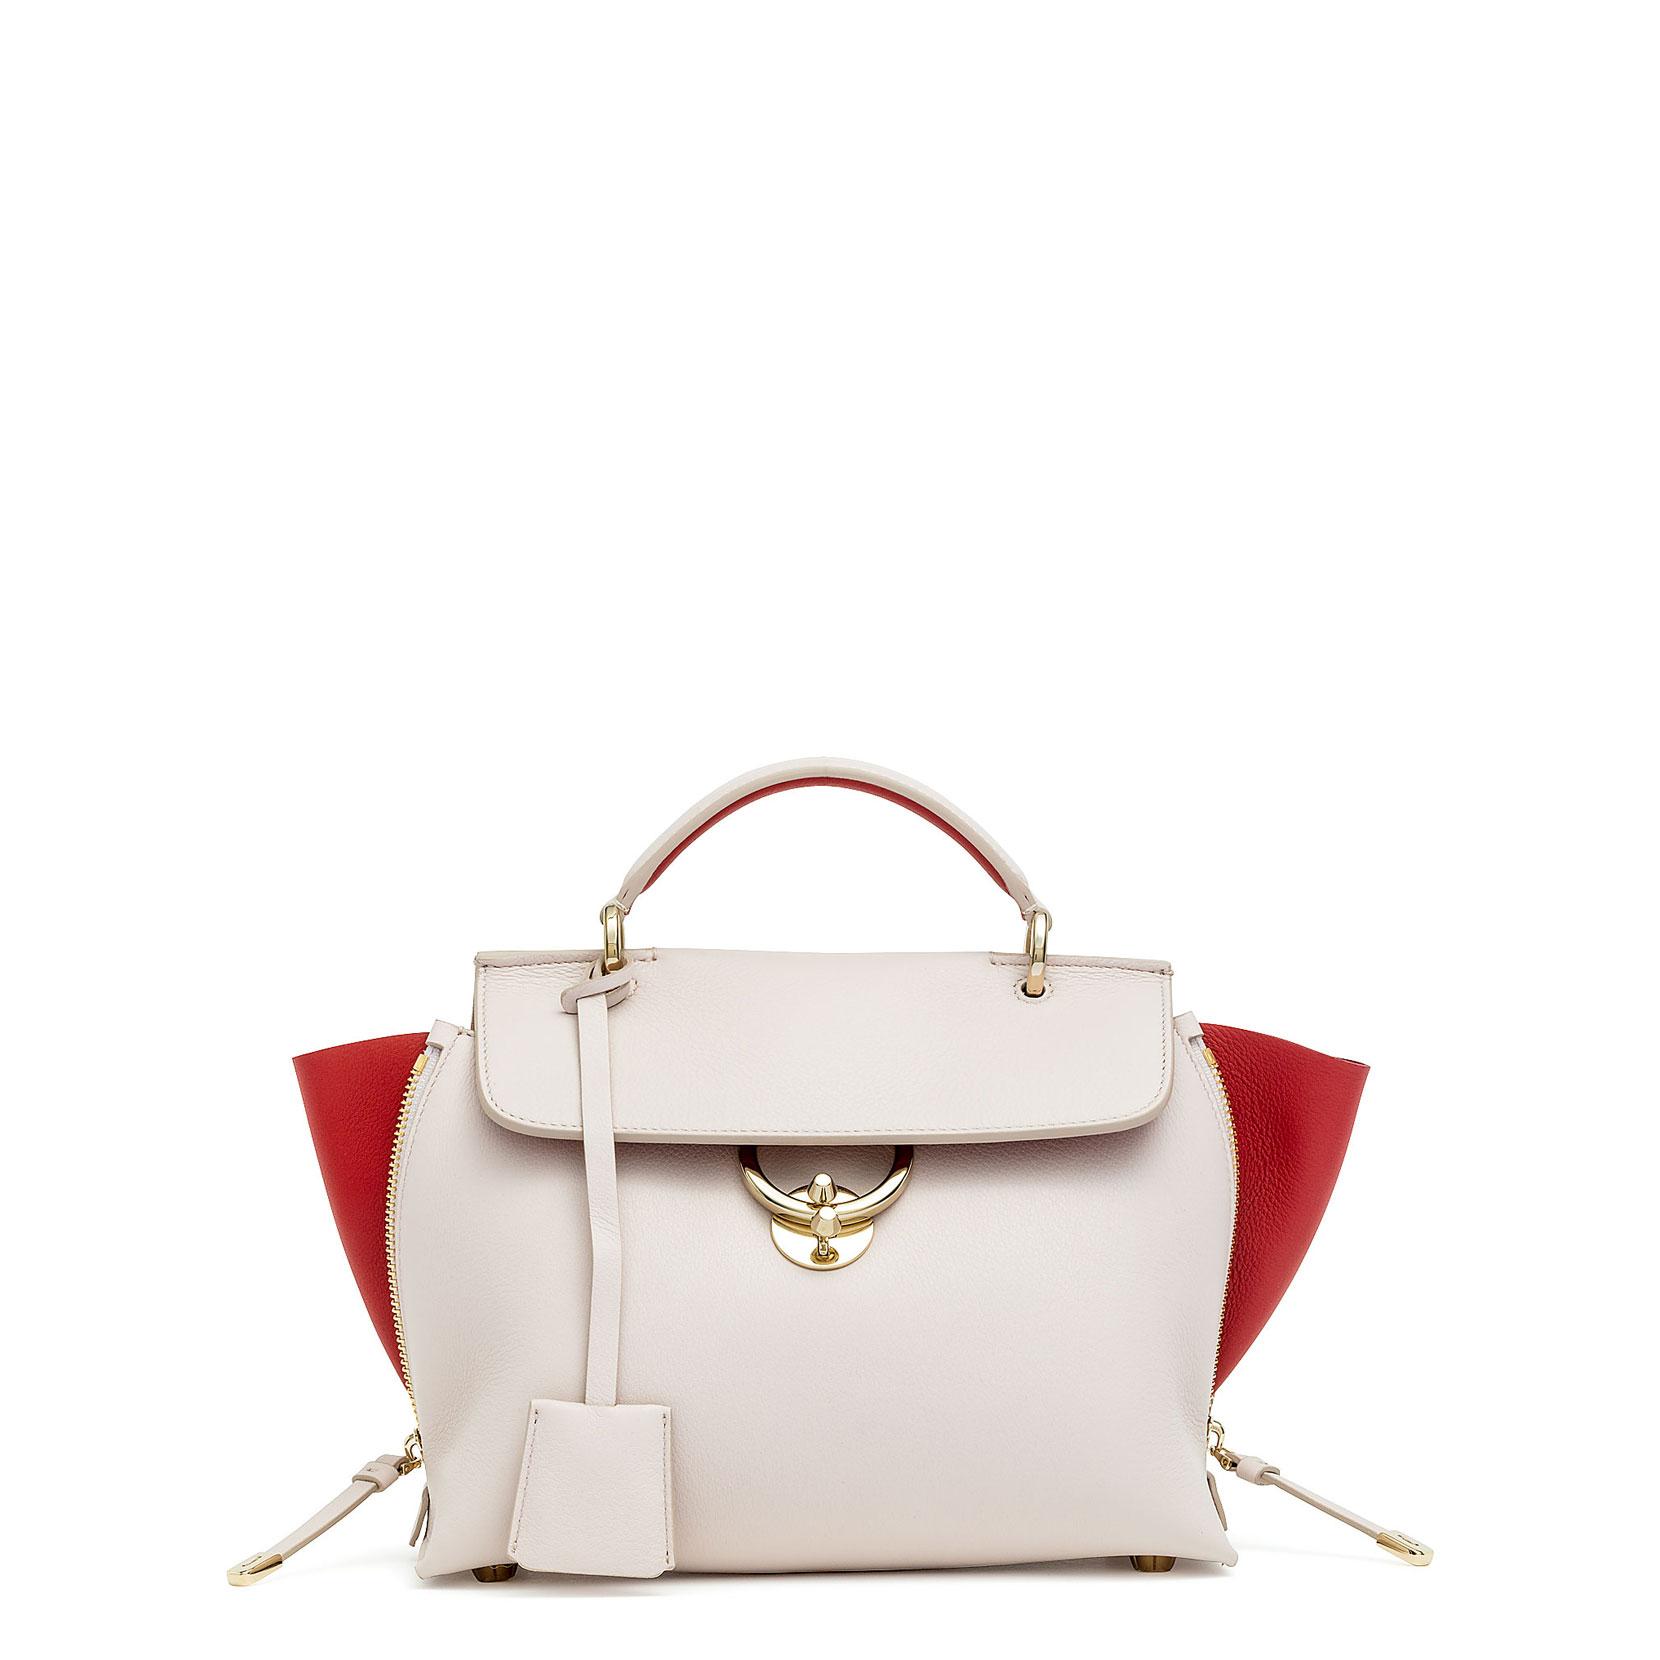 4ddd57253a607 Salvatore Ferragamo Jet Set S Off White (Jasmine) Leather Bag In Beige/White